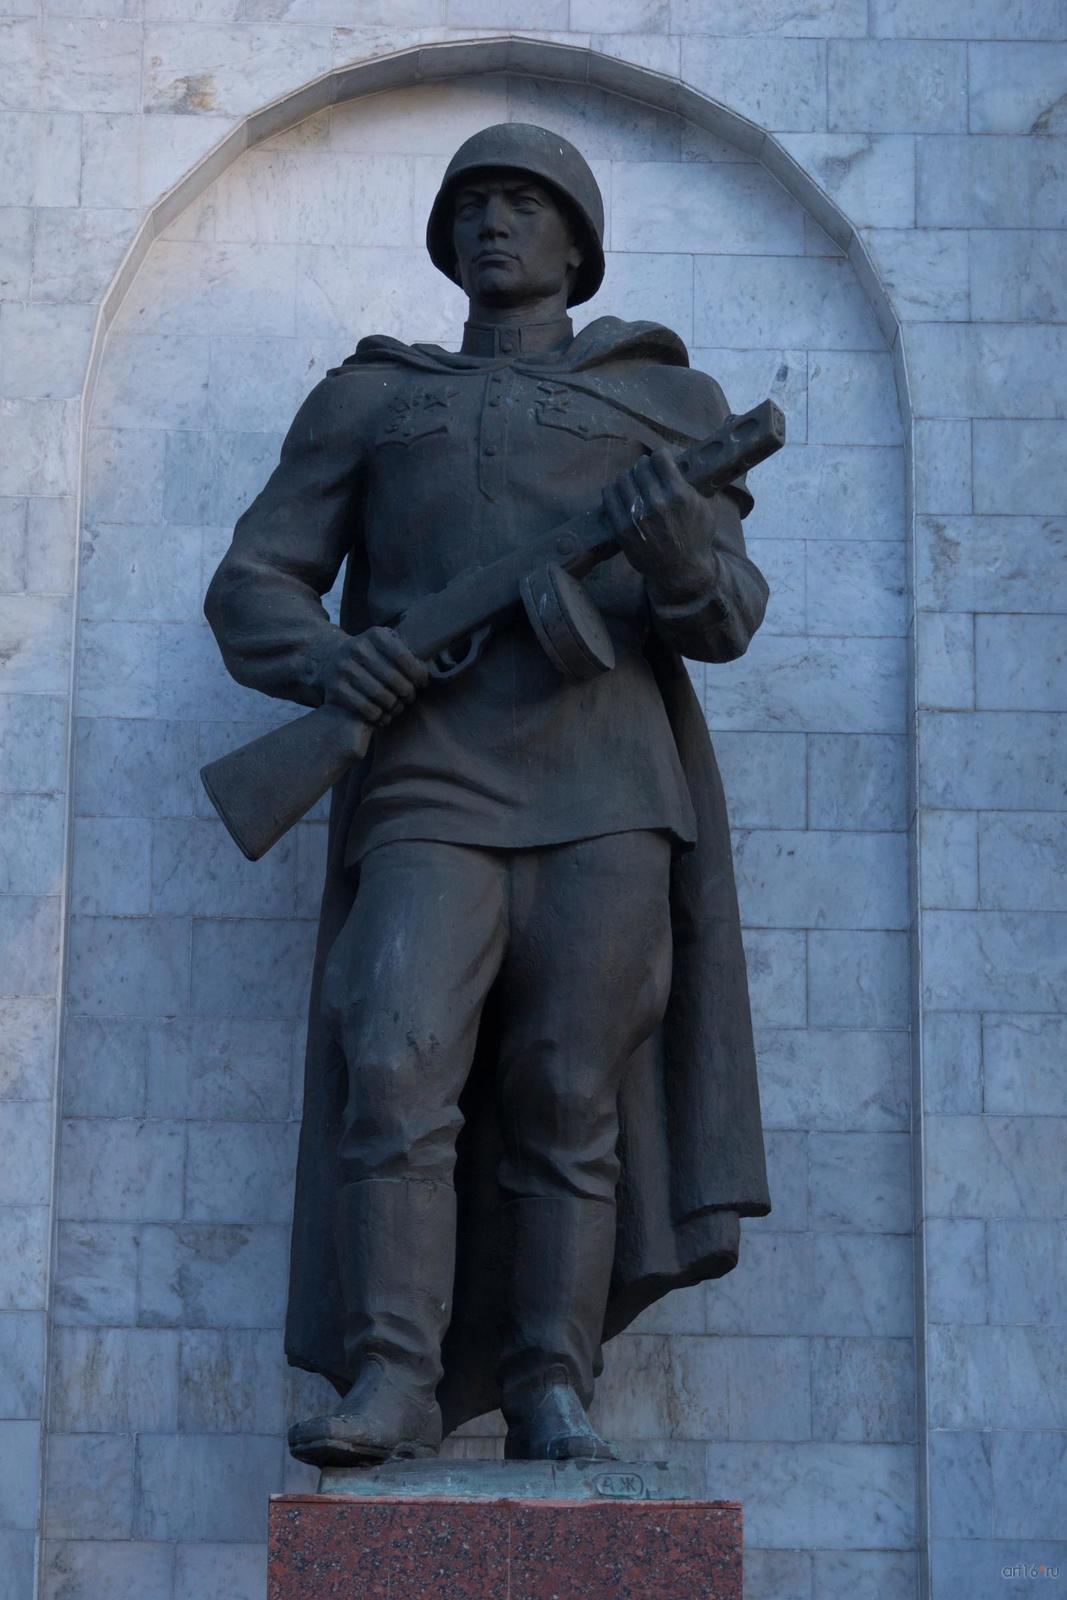 Фото №828915. Скульптура пехотинца (скульптор - А. 3. Жиленков)